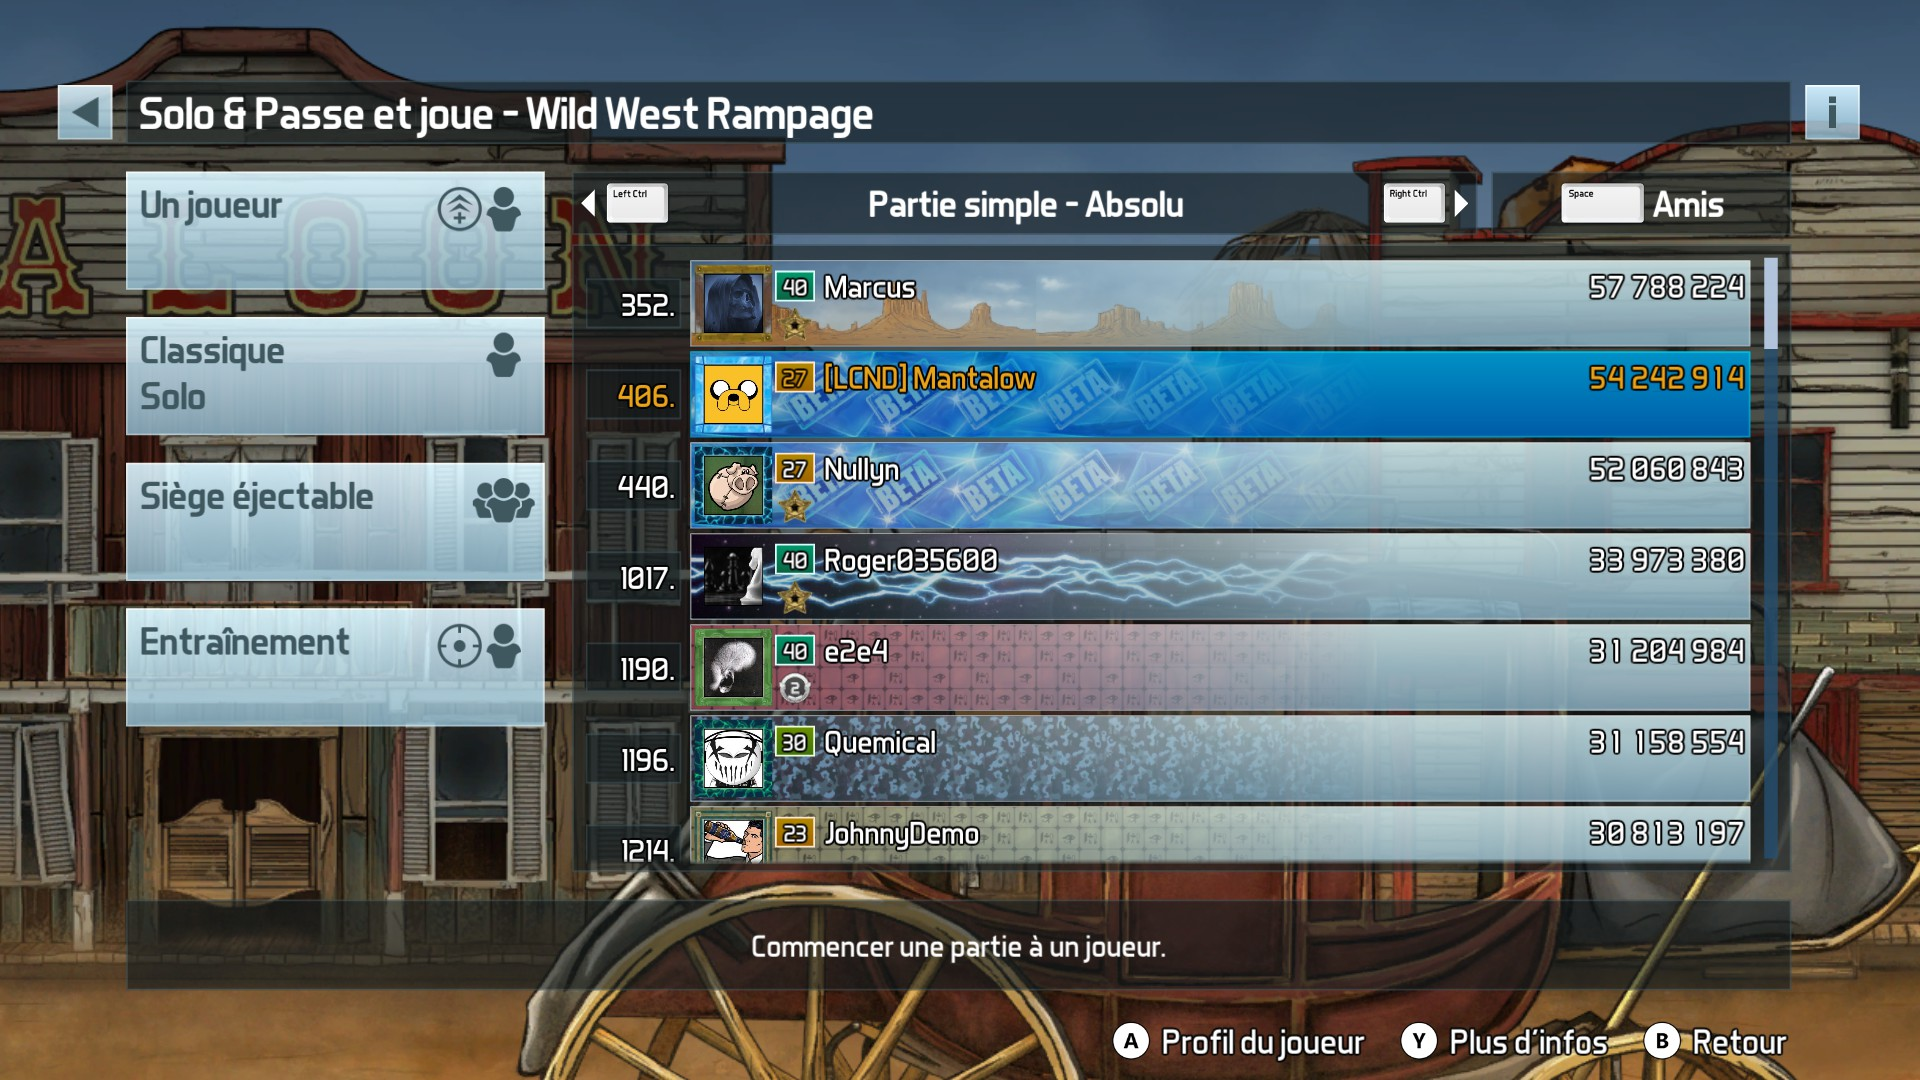 Mantalow: Pinball FX3: Wild West Rampage (PC) 54,242,914 points on 2017-12-19 10:46:08